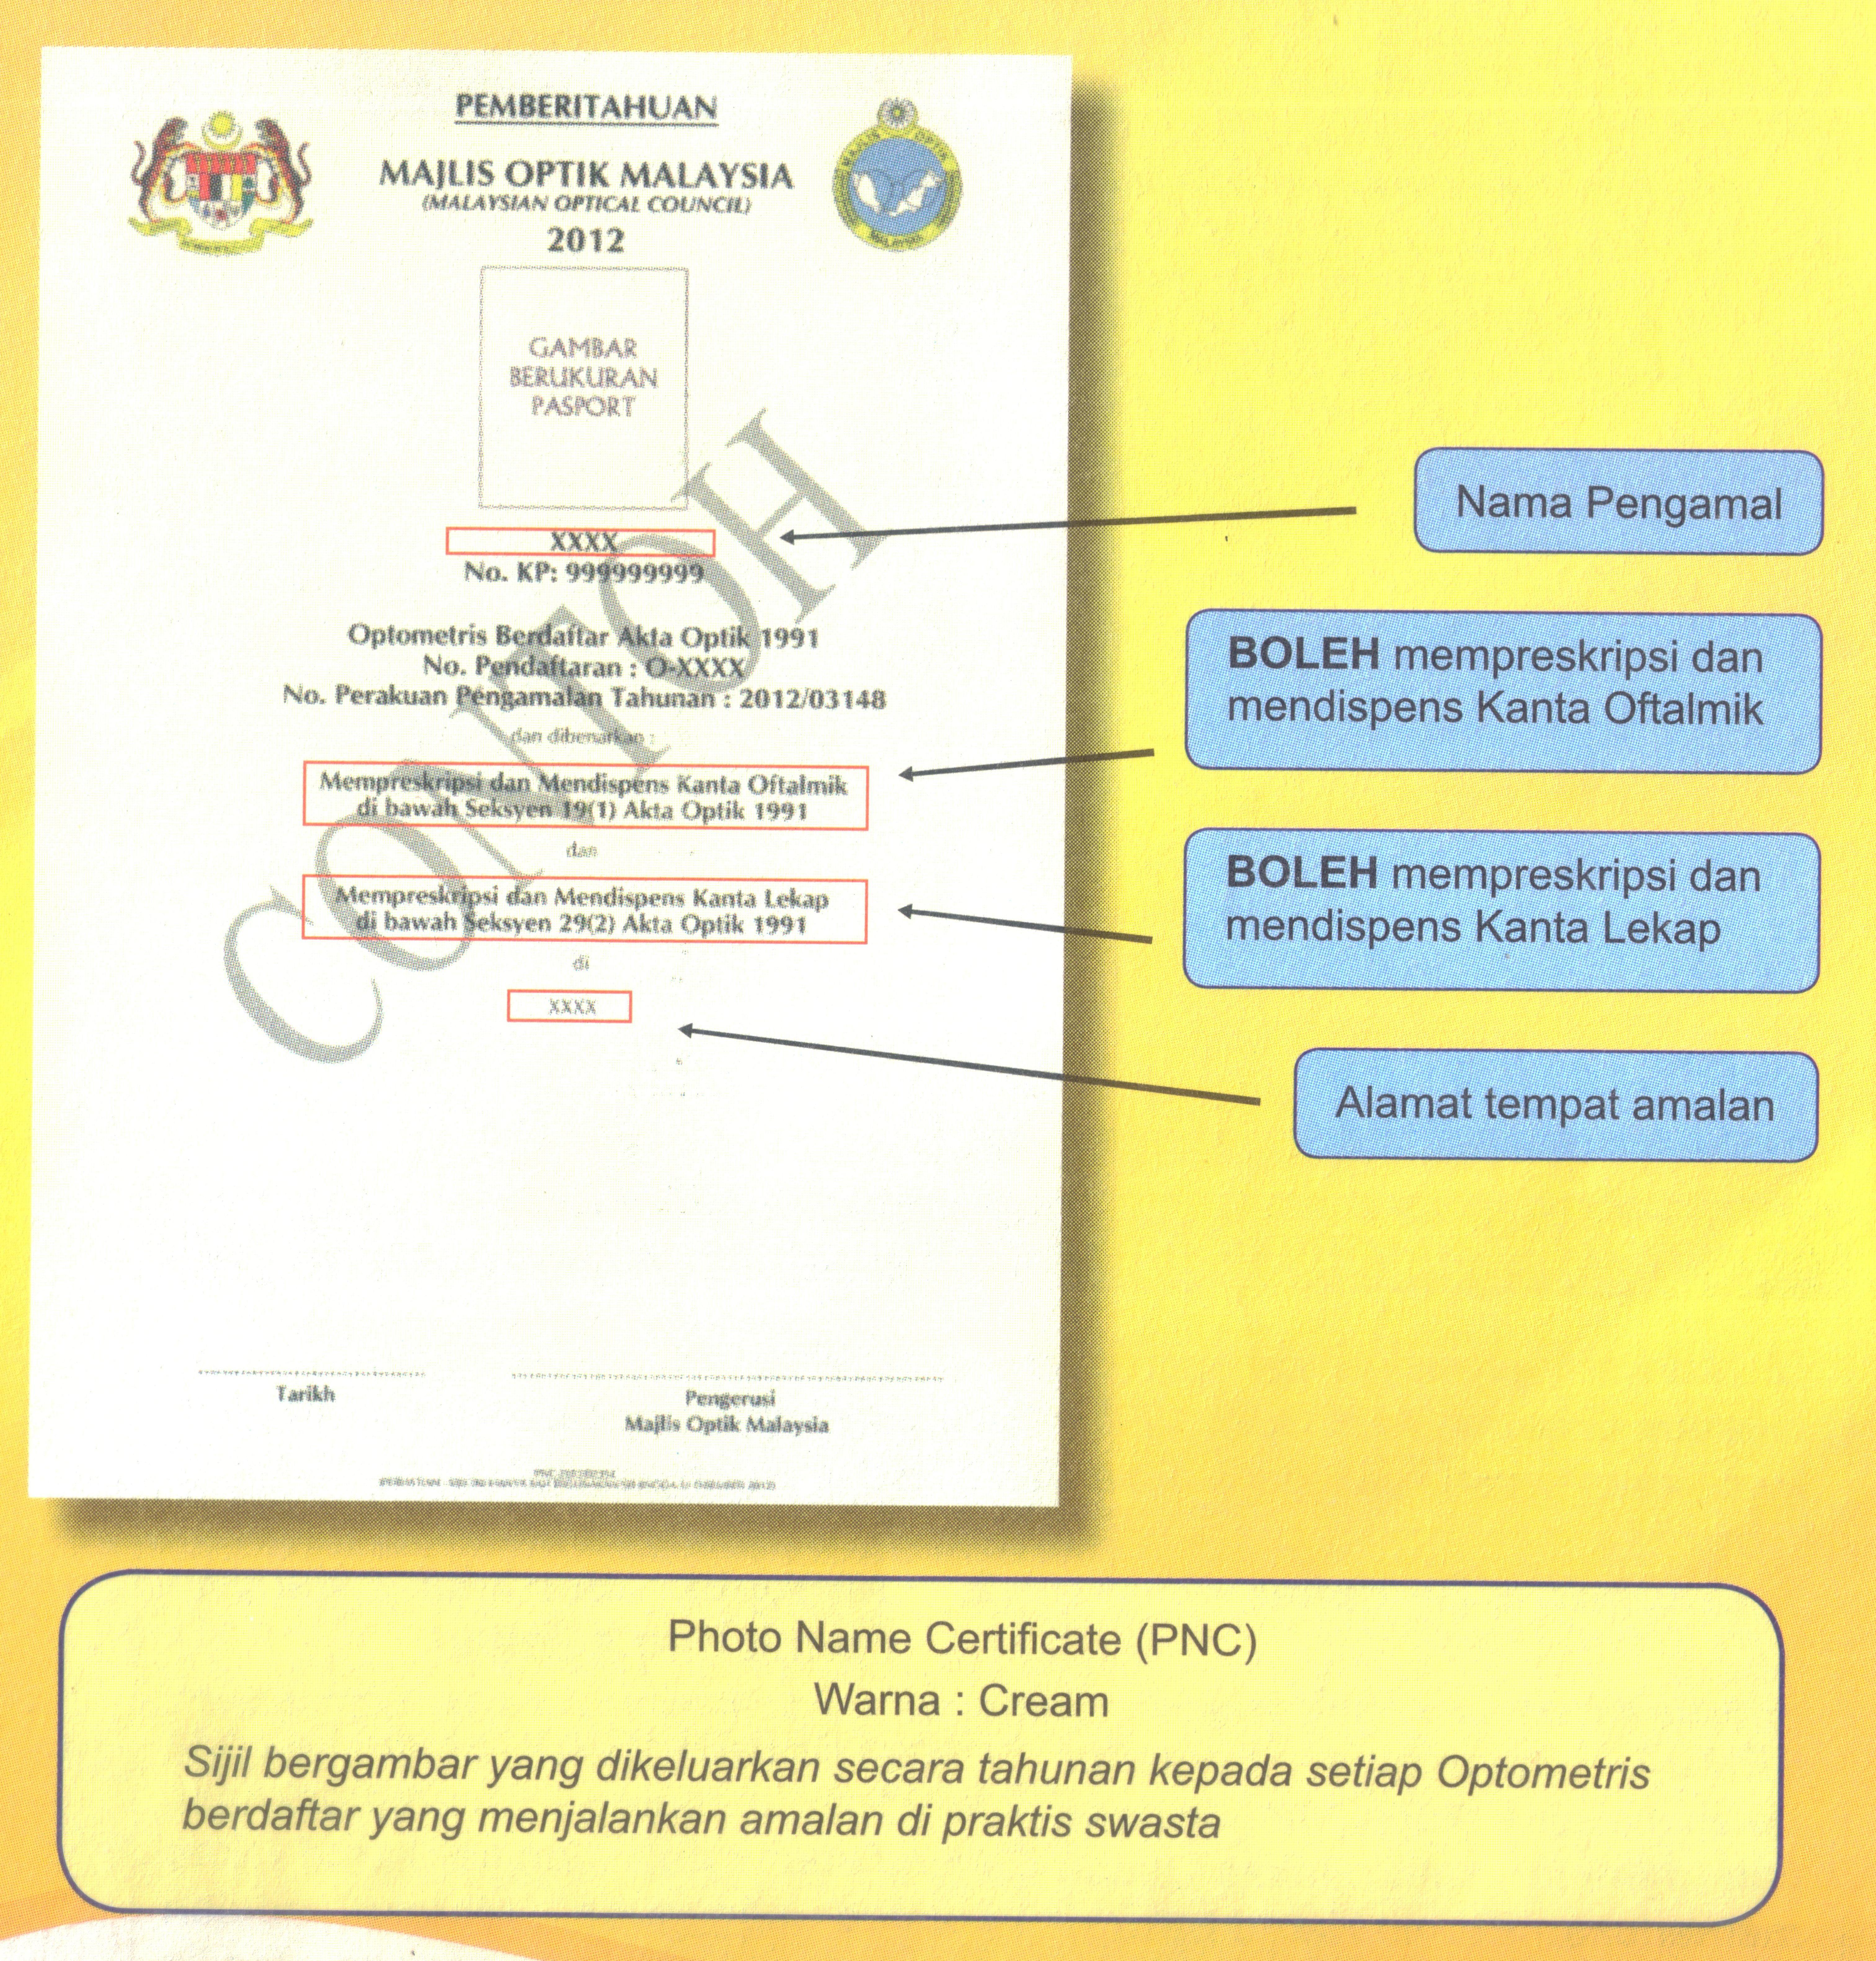 Malaysian optometrists photo name certificate pnc produced by malaysian optometrists photo name certificate pnc produced by malaysia optical council moc xflitez Gallery